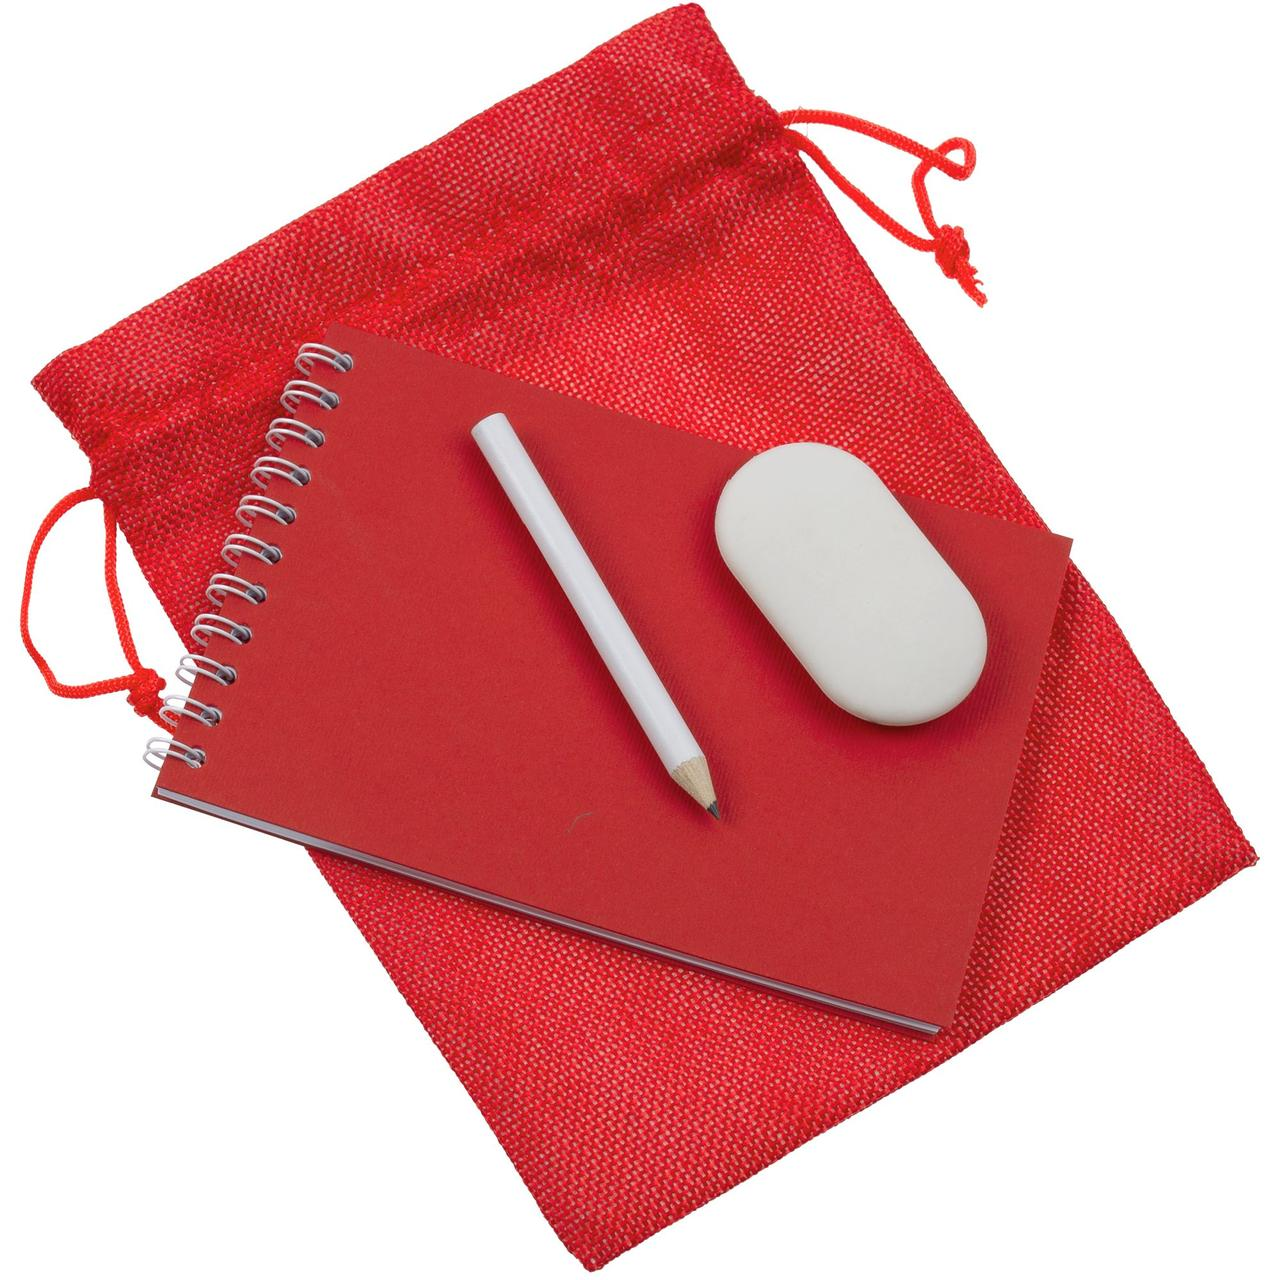 Набор Nettuno Mini, красный (артикул 16127.50)